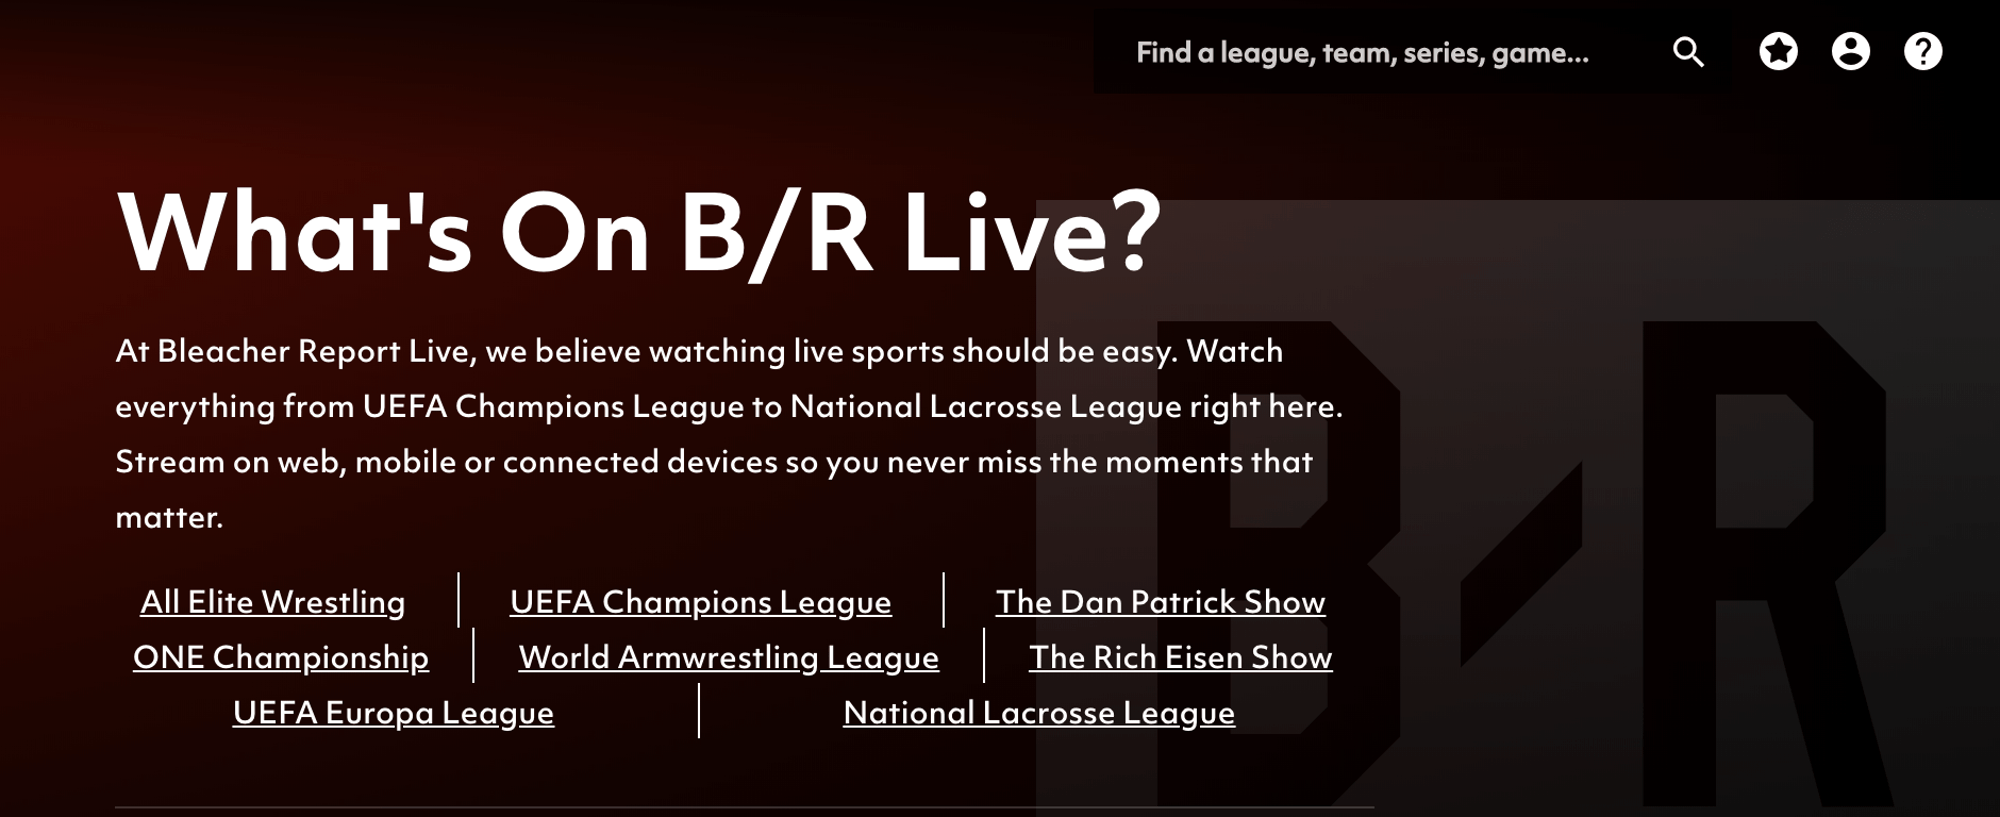 2019-20 uefa champions league barcelona vs slavia praha soccer live stream free b-r live